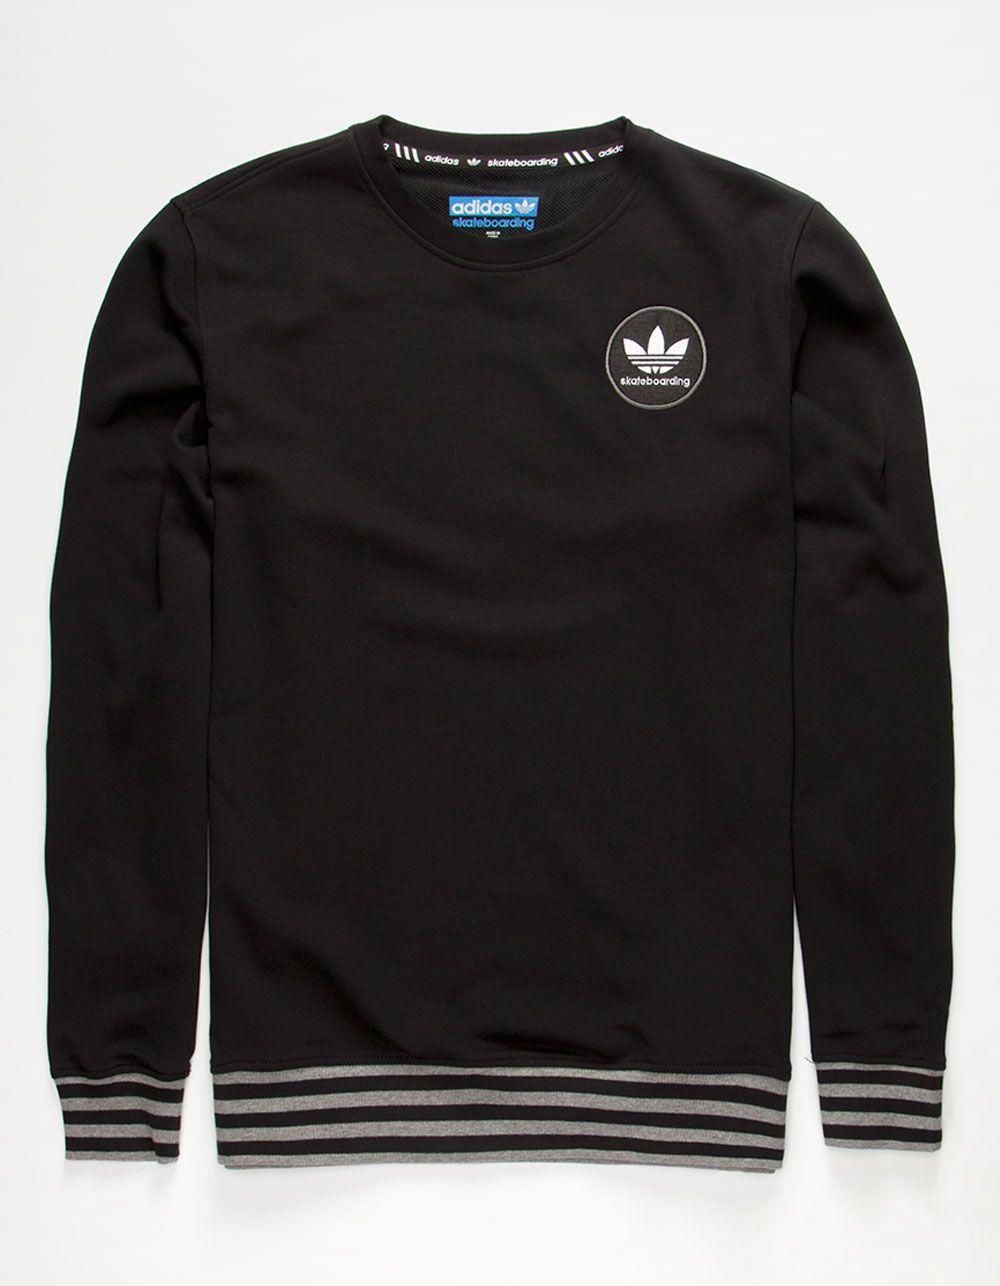 adidas Trefoil Crew-neck Sweatshirt - Urban Outfitters   Men's ...